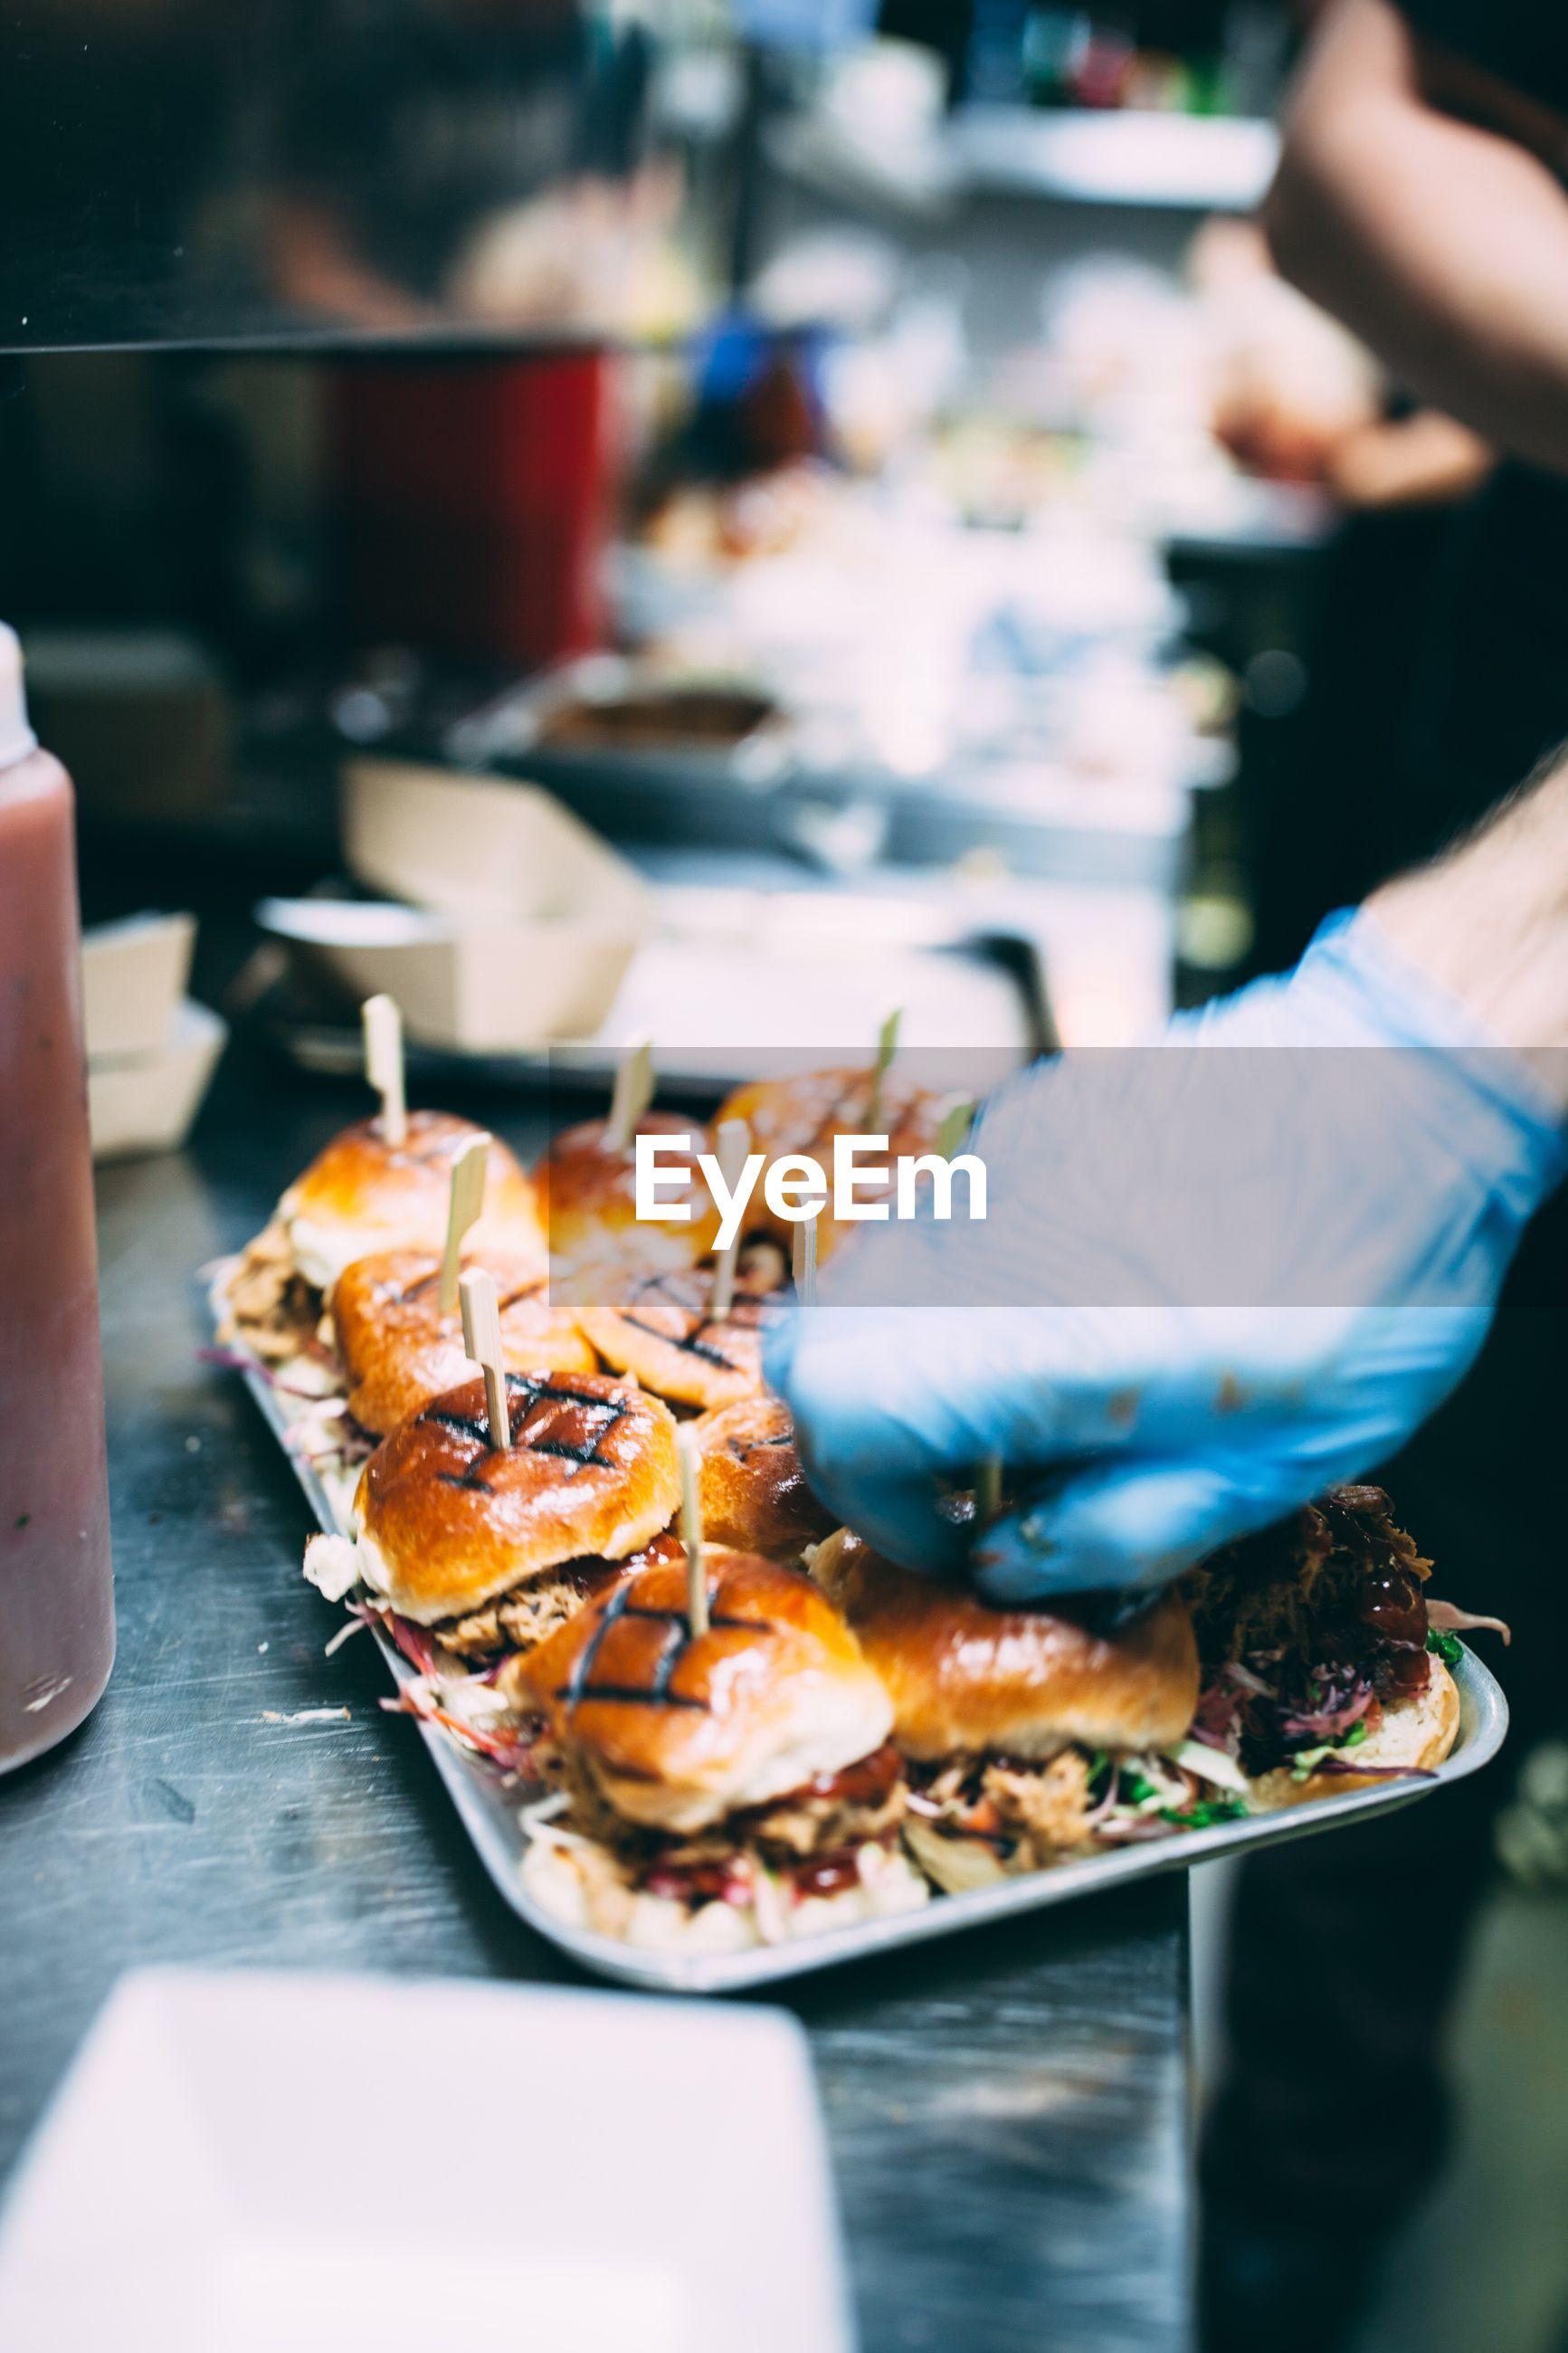 Close-up of man preparing burger on tray at concession stand